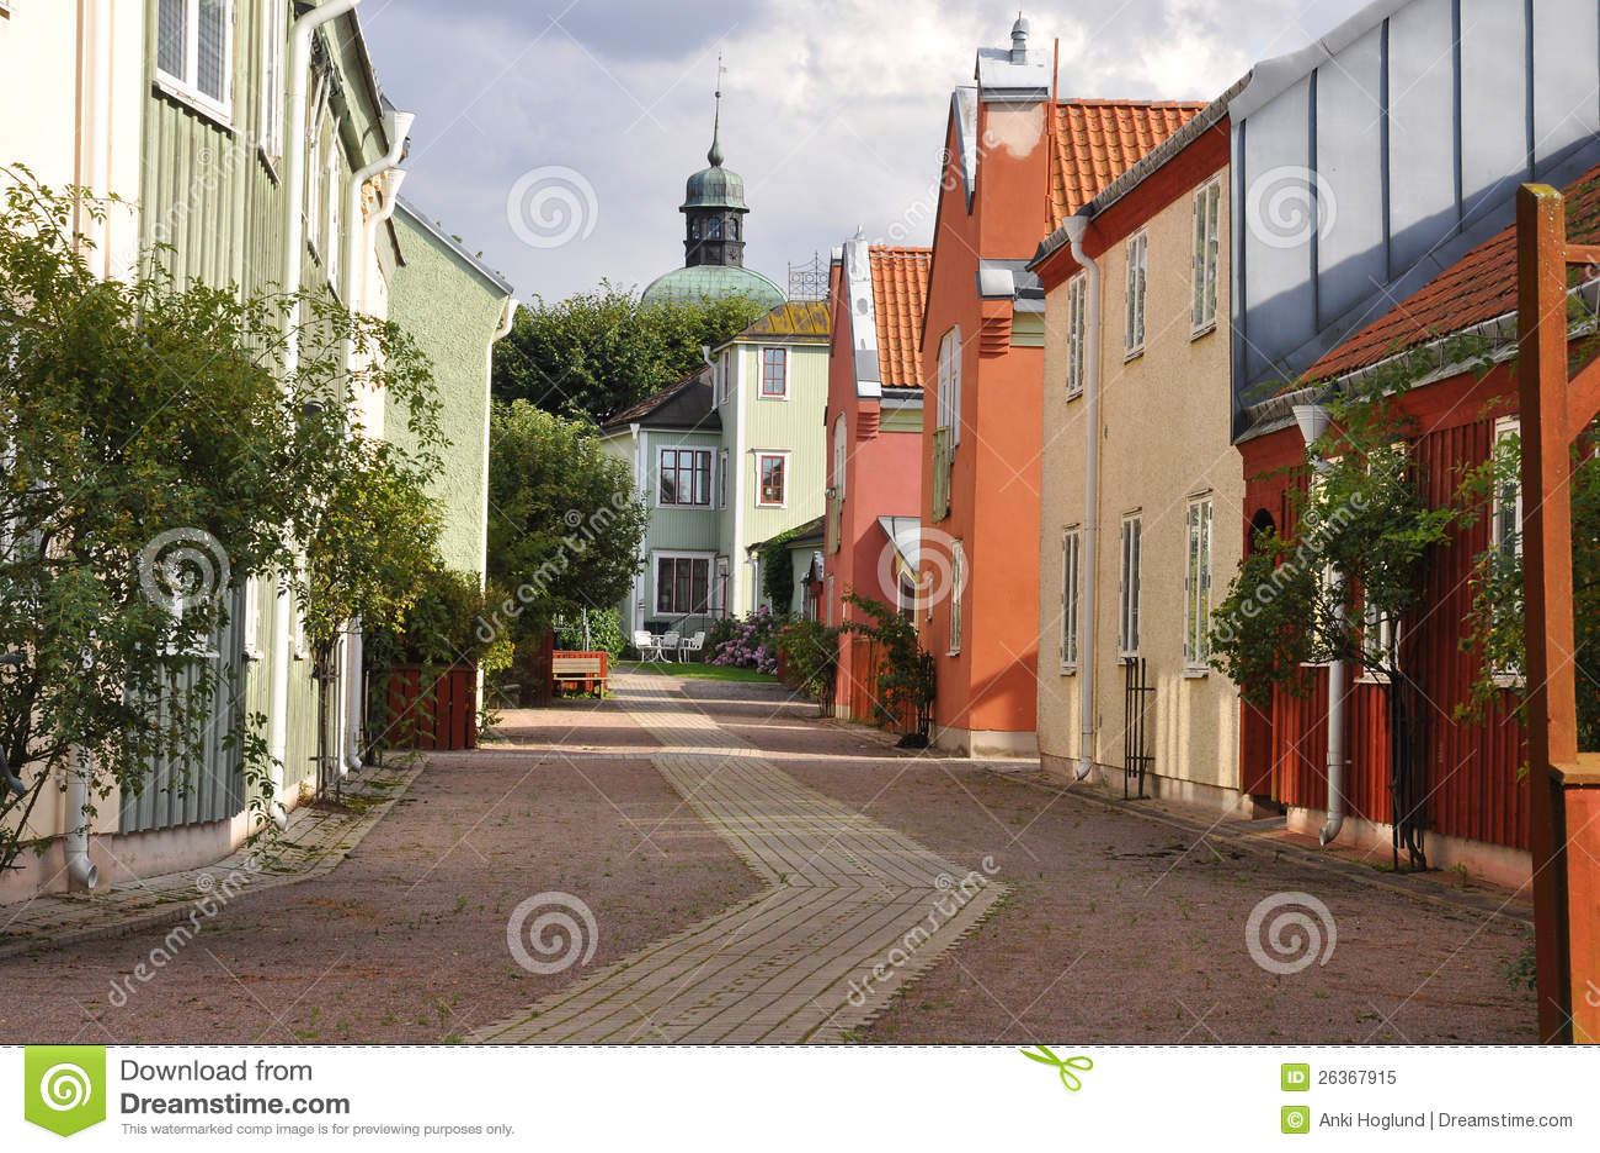 Malerische medival Stadt